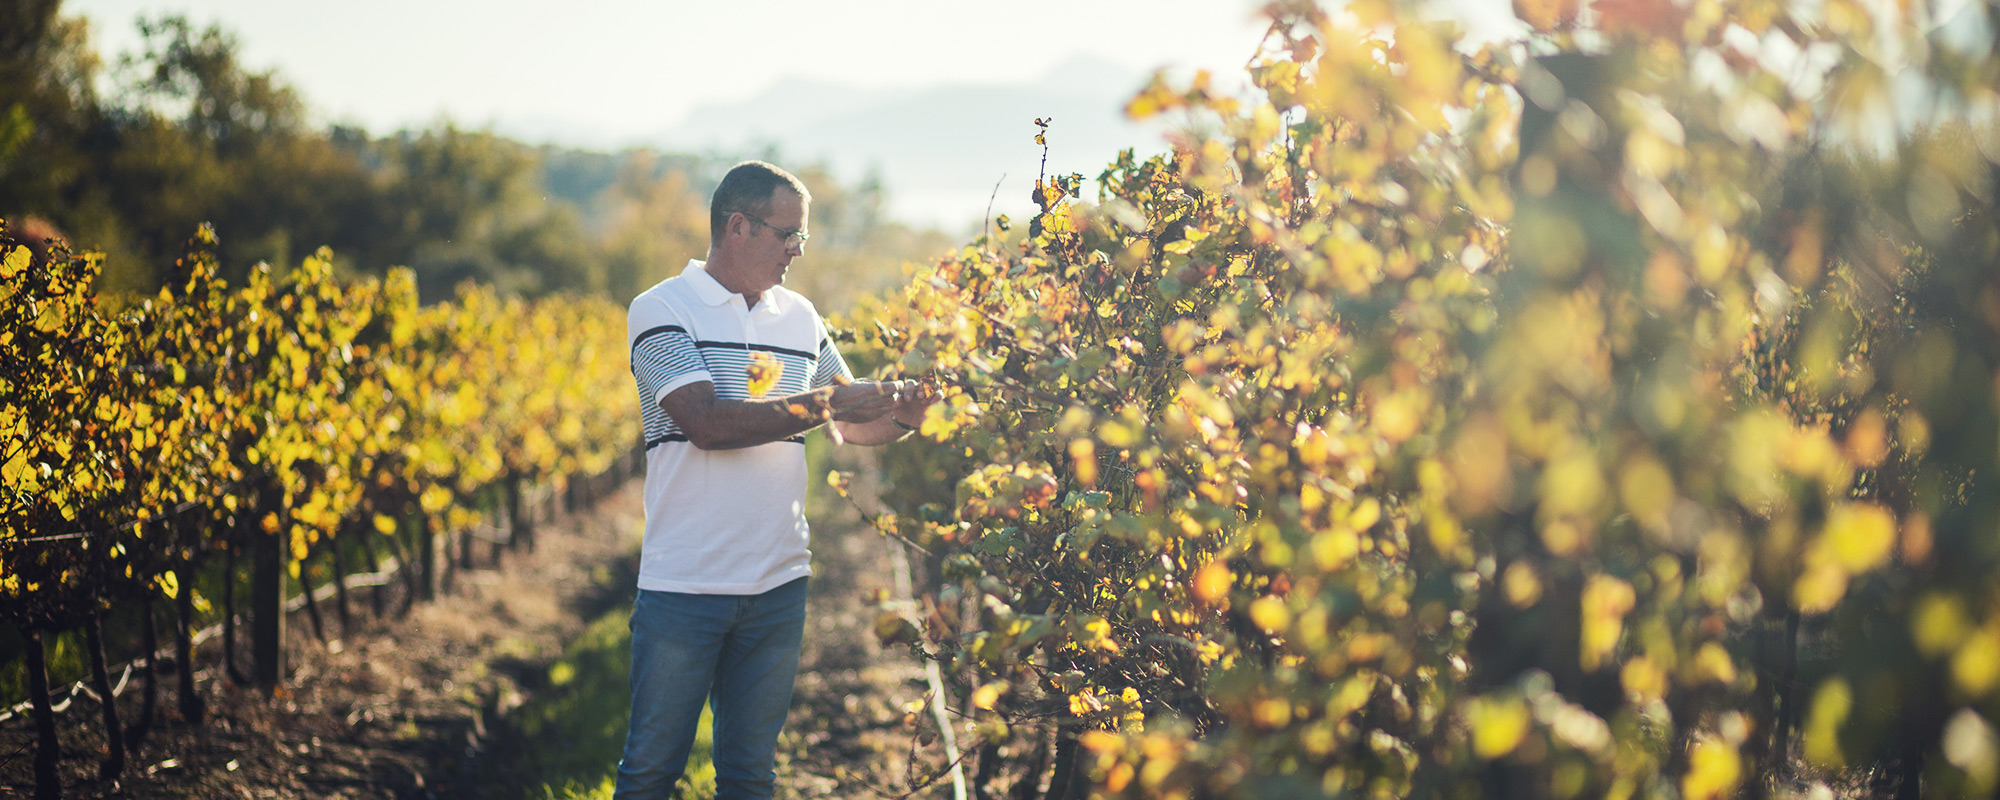 Niel Bester inspecting grapes in the vineyards of Plaisir de Merle